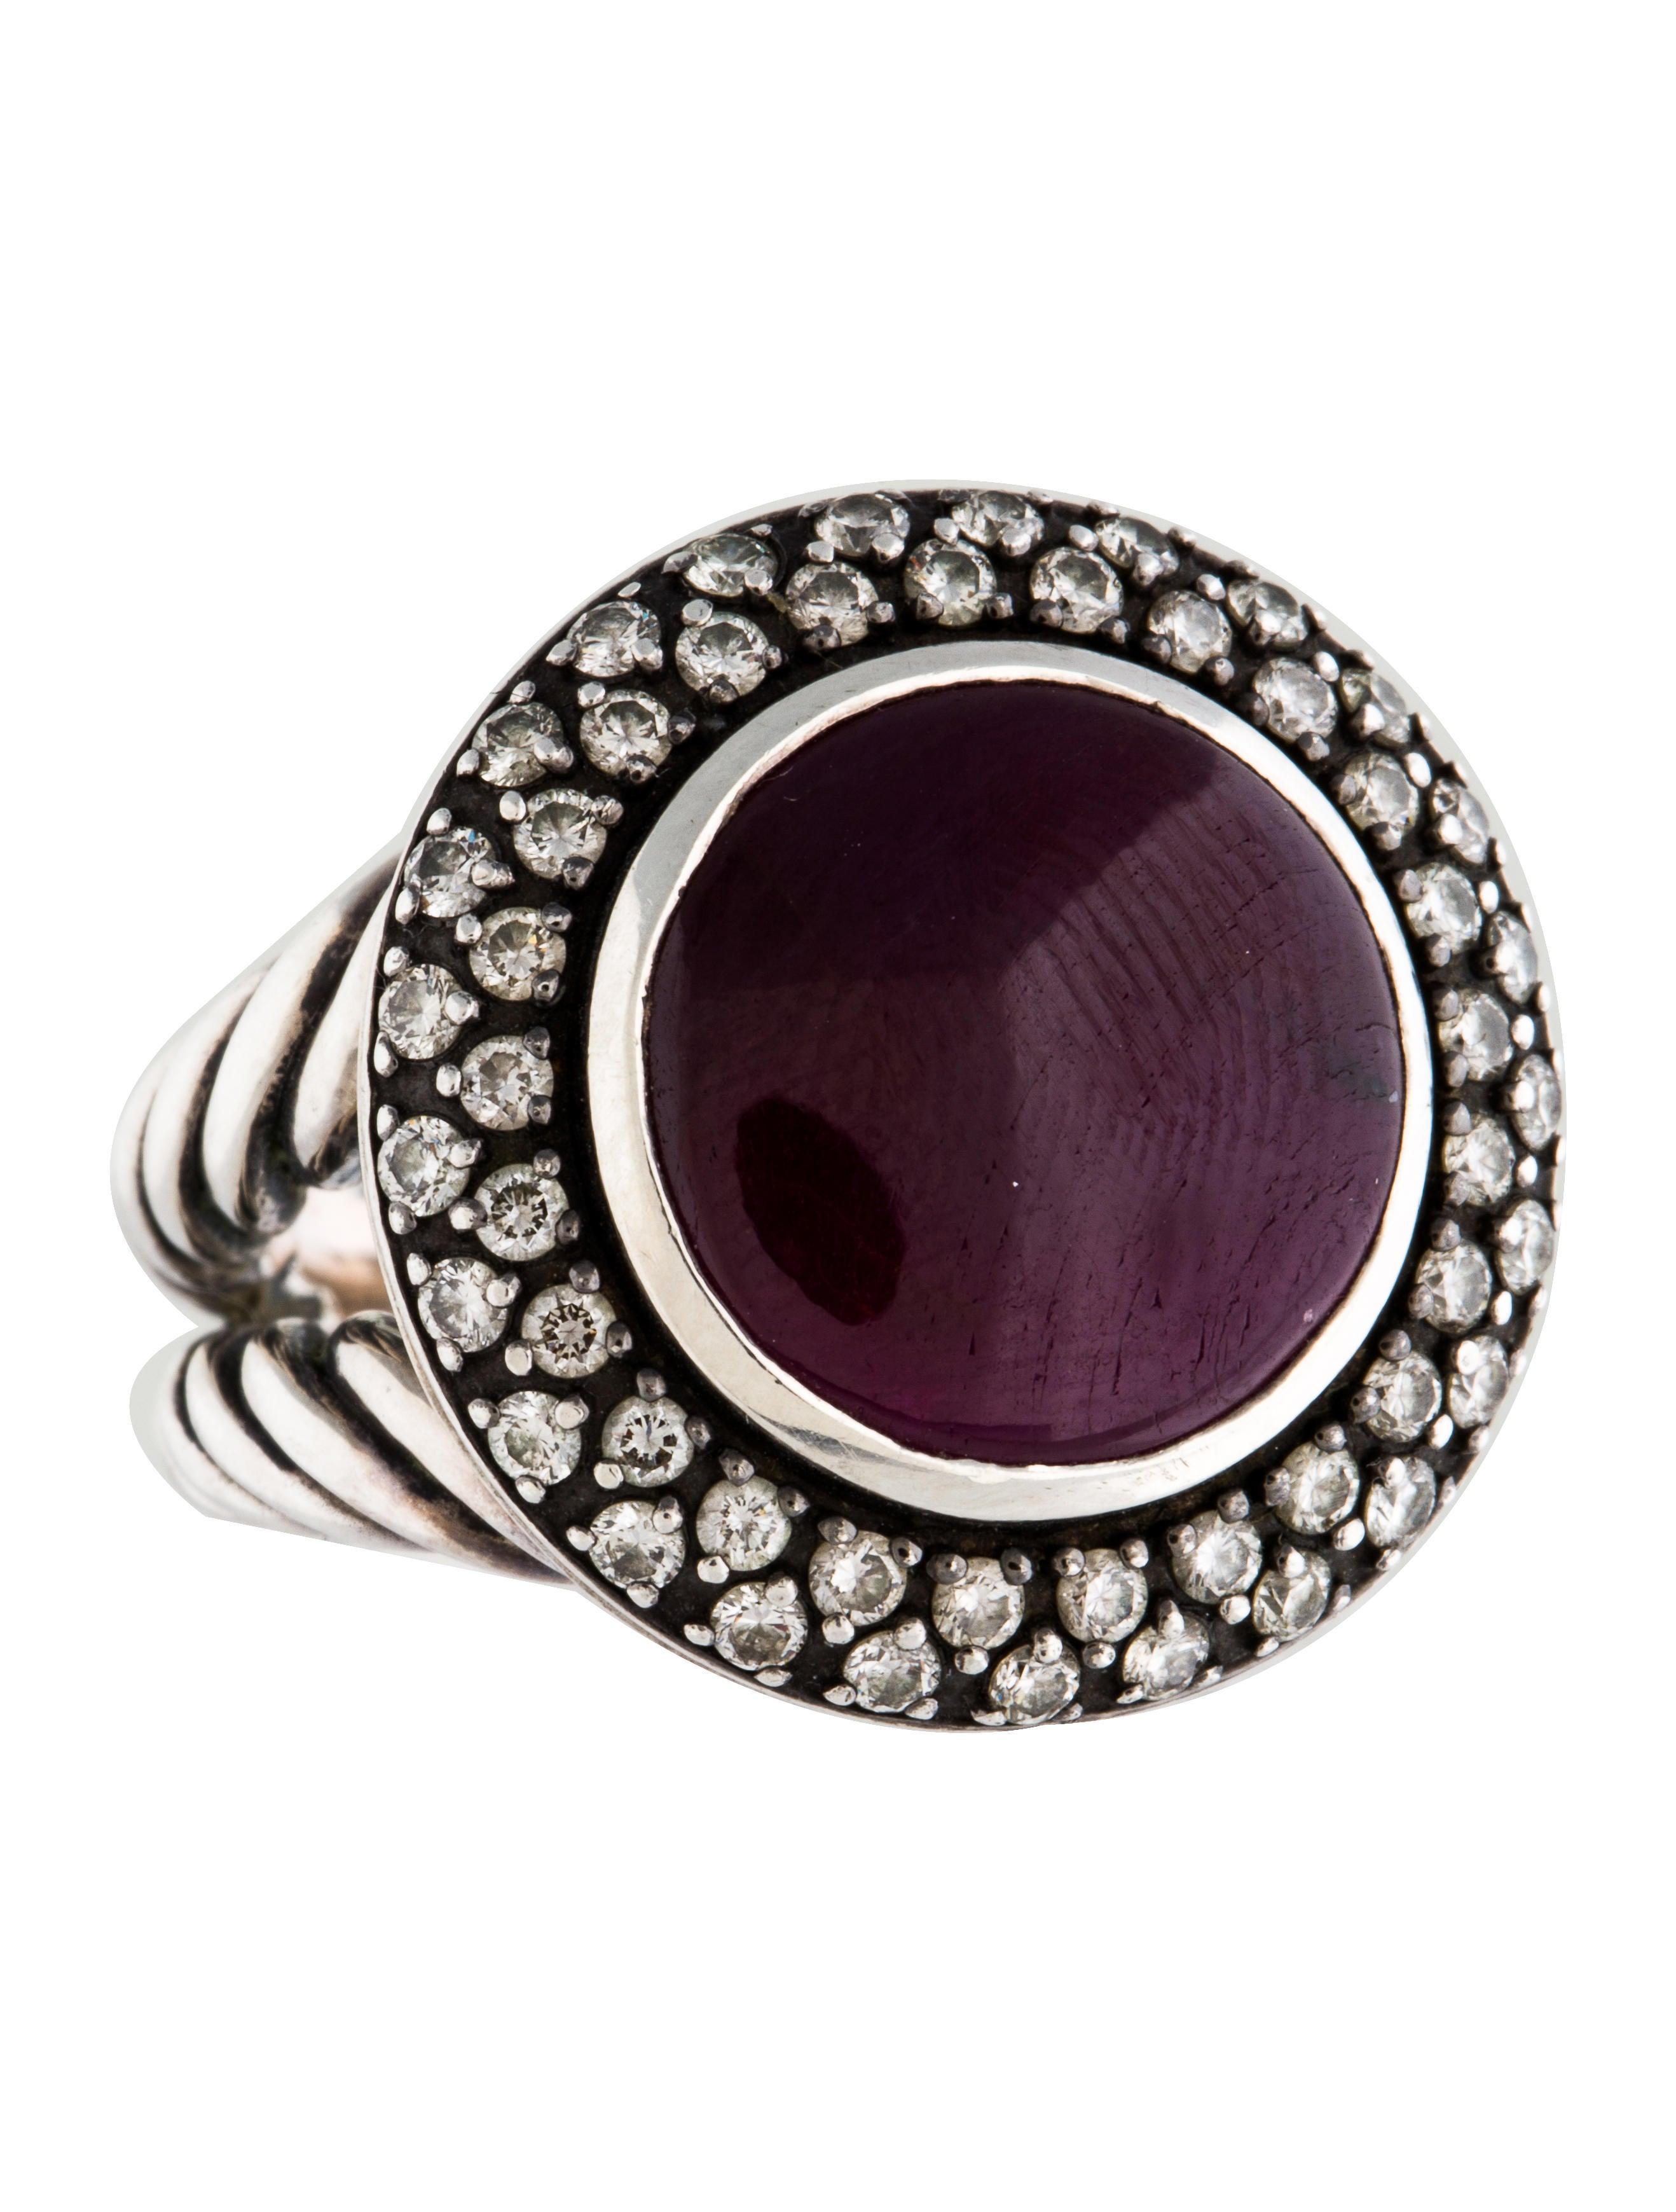 David yurman ruby diamond ring rings dvy38793 the for David yurman inspired jewelry rings